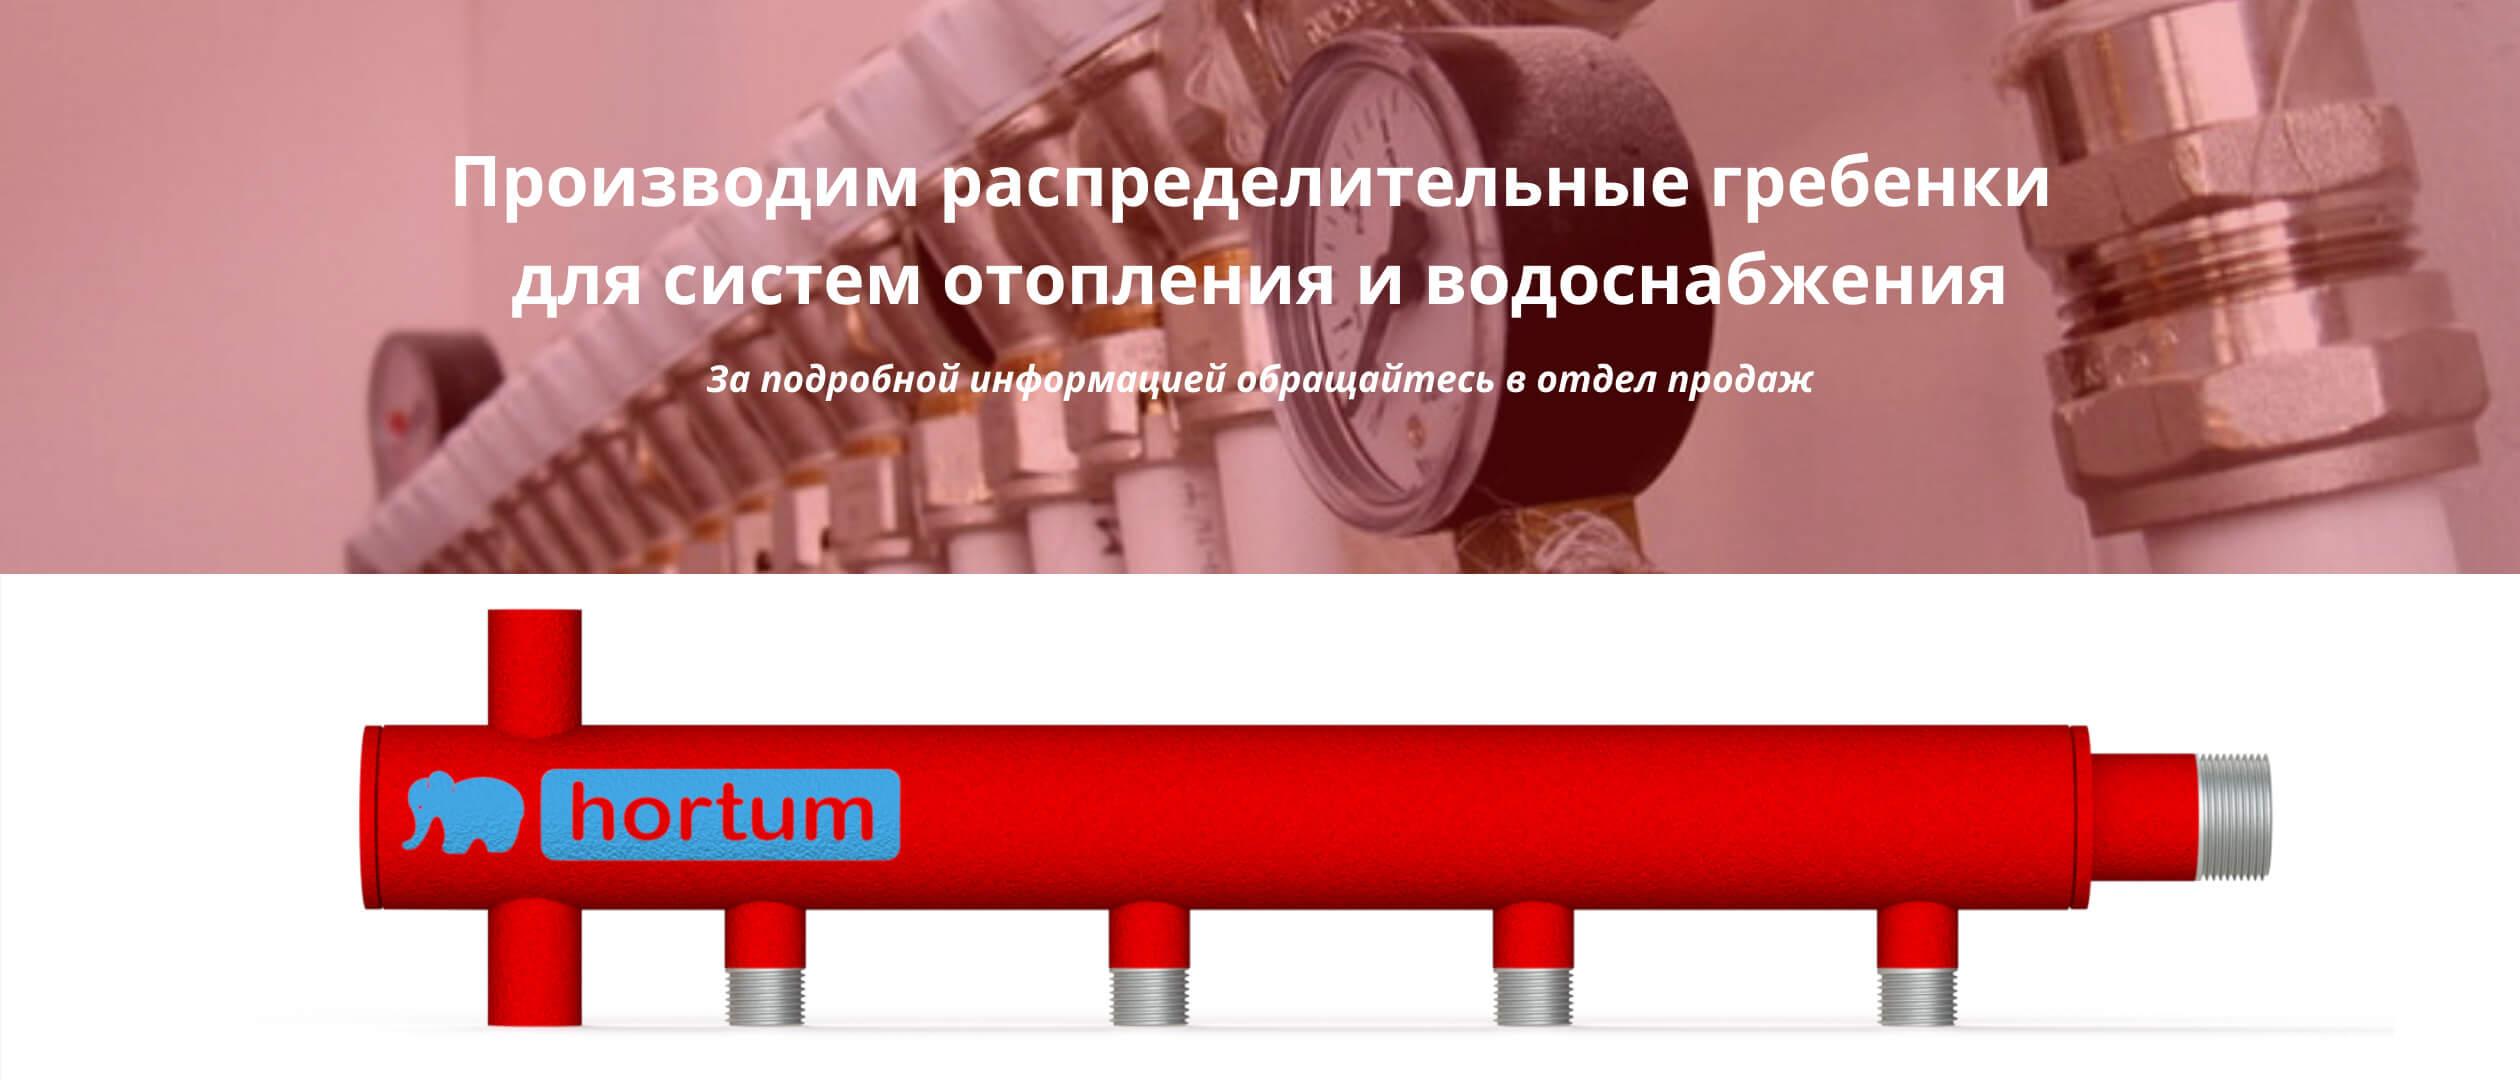 Коллектор ХОРТУМ